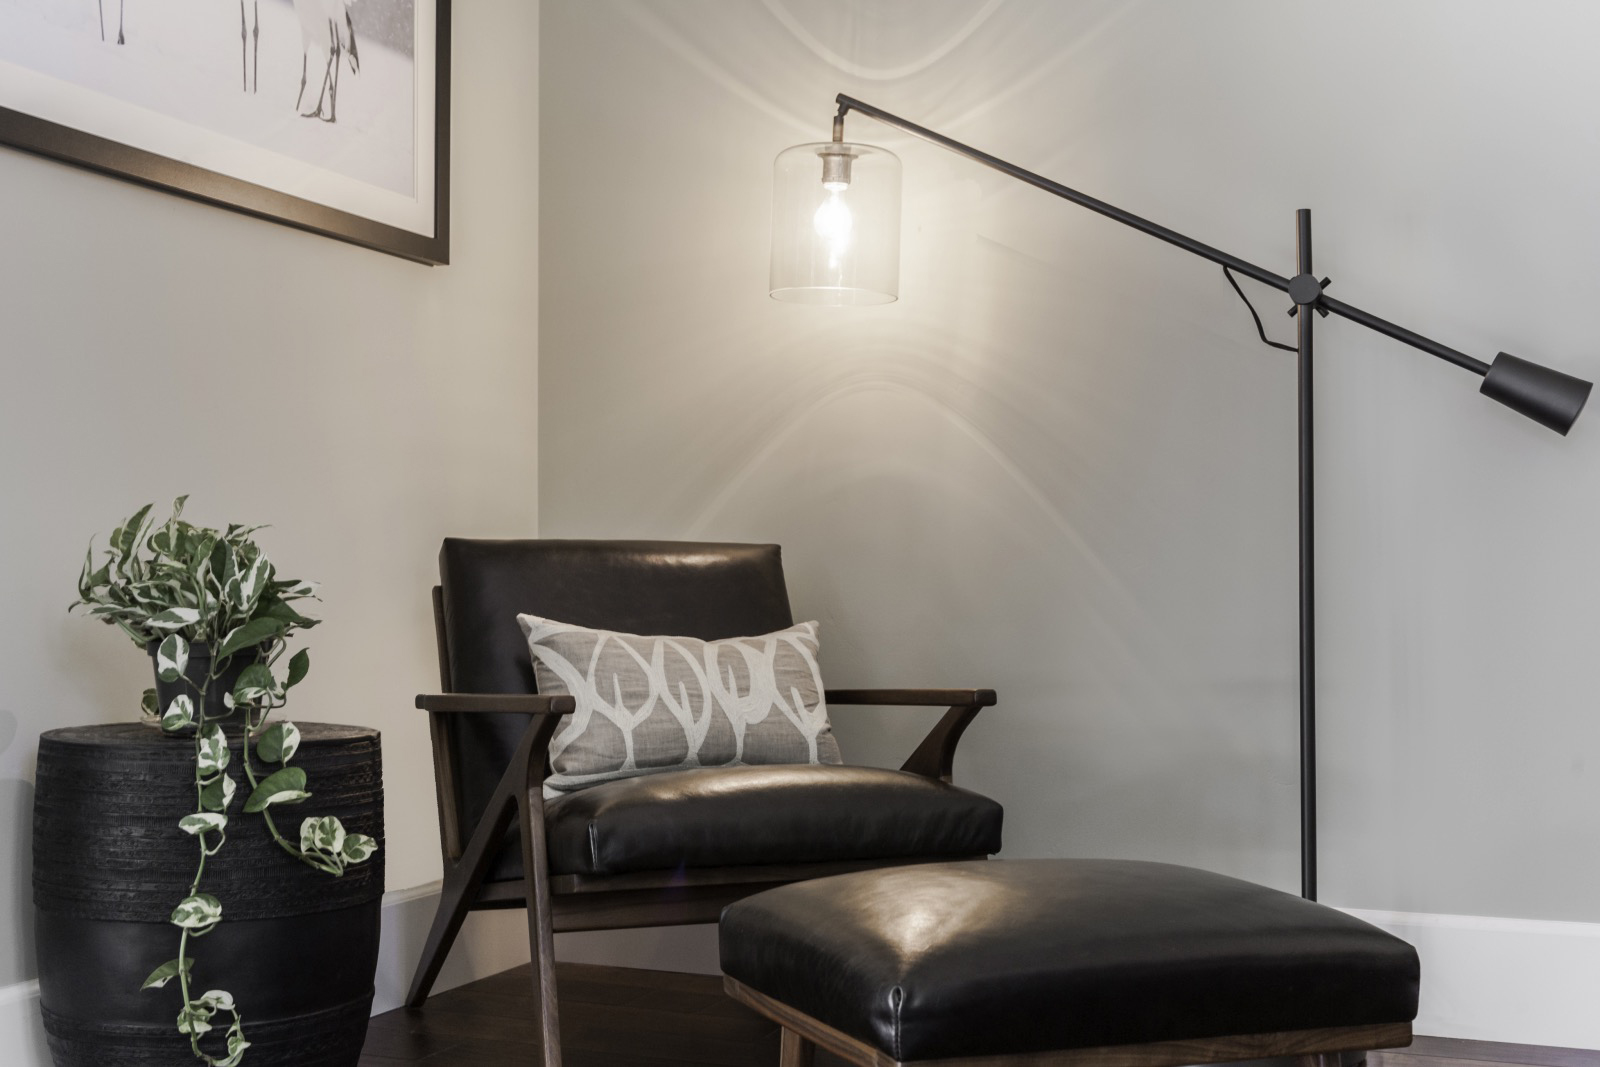 T-Master-Bedroom-Accents.JPG